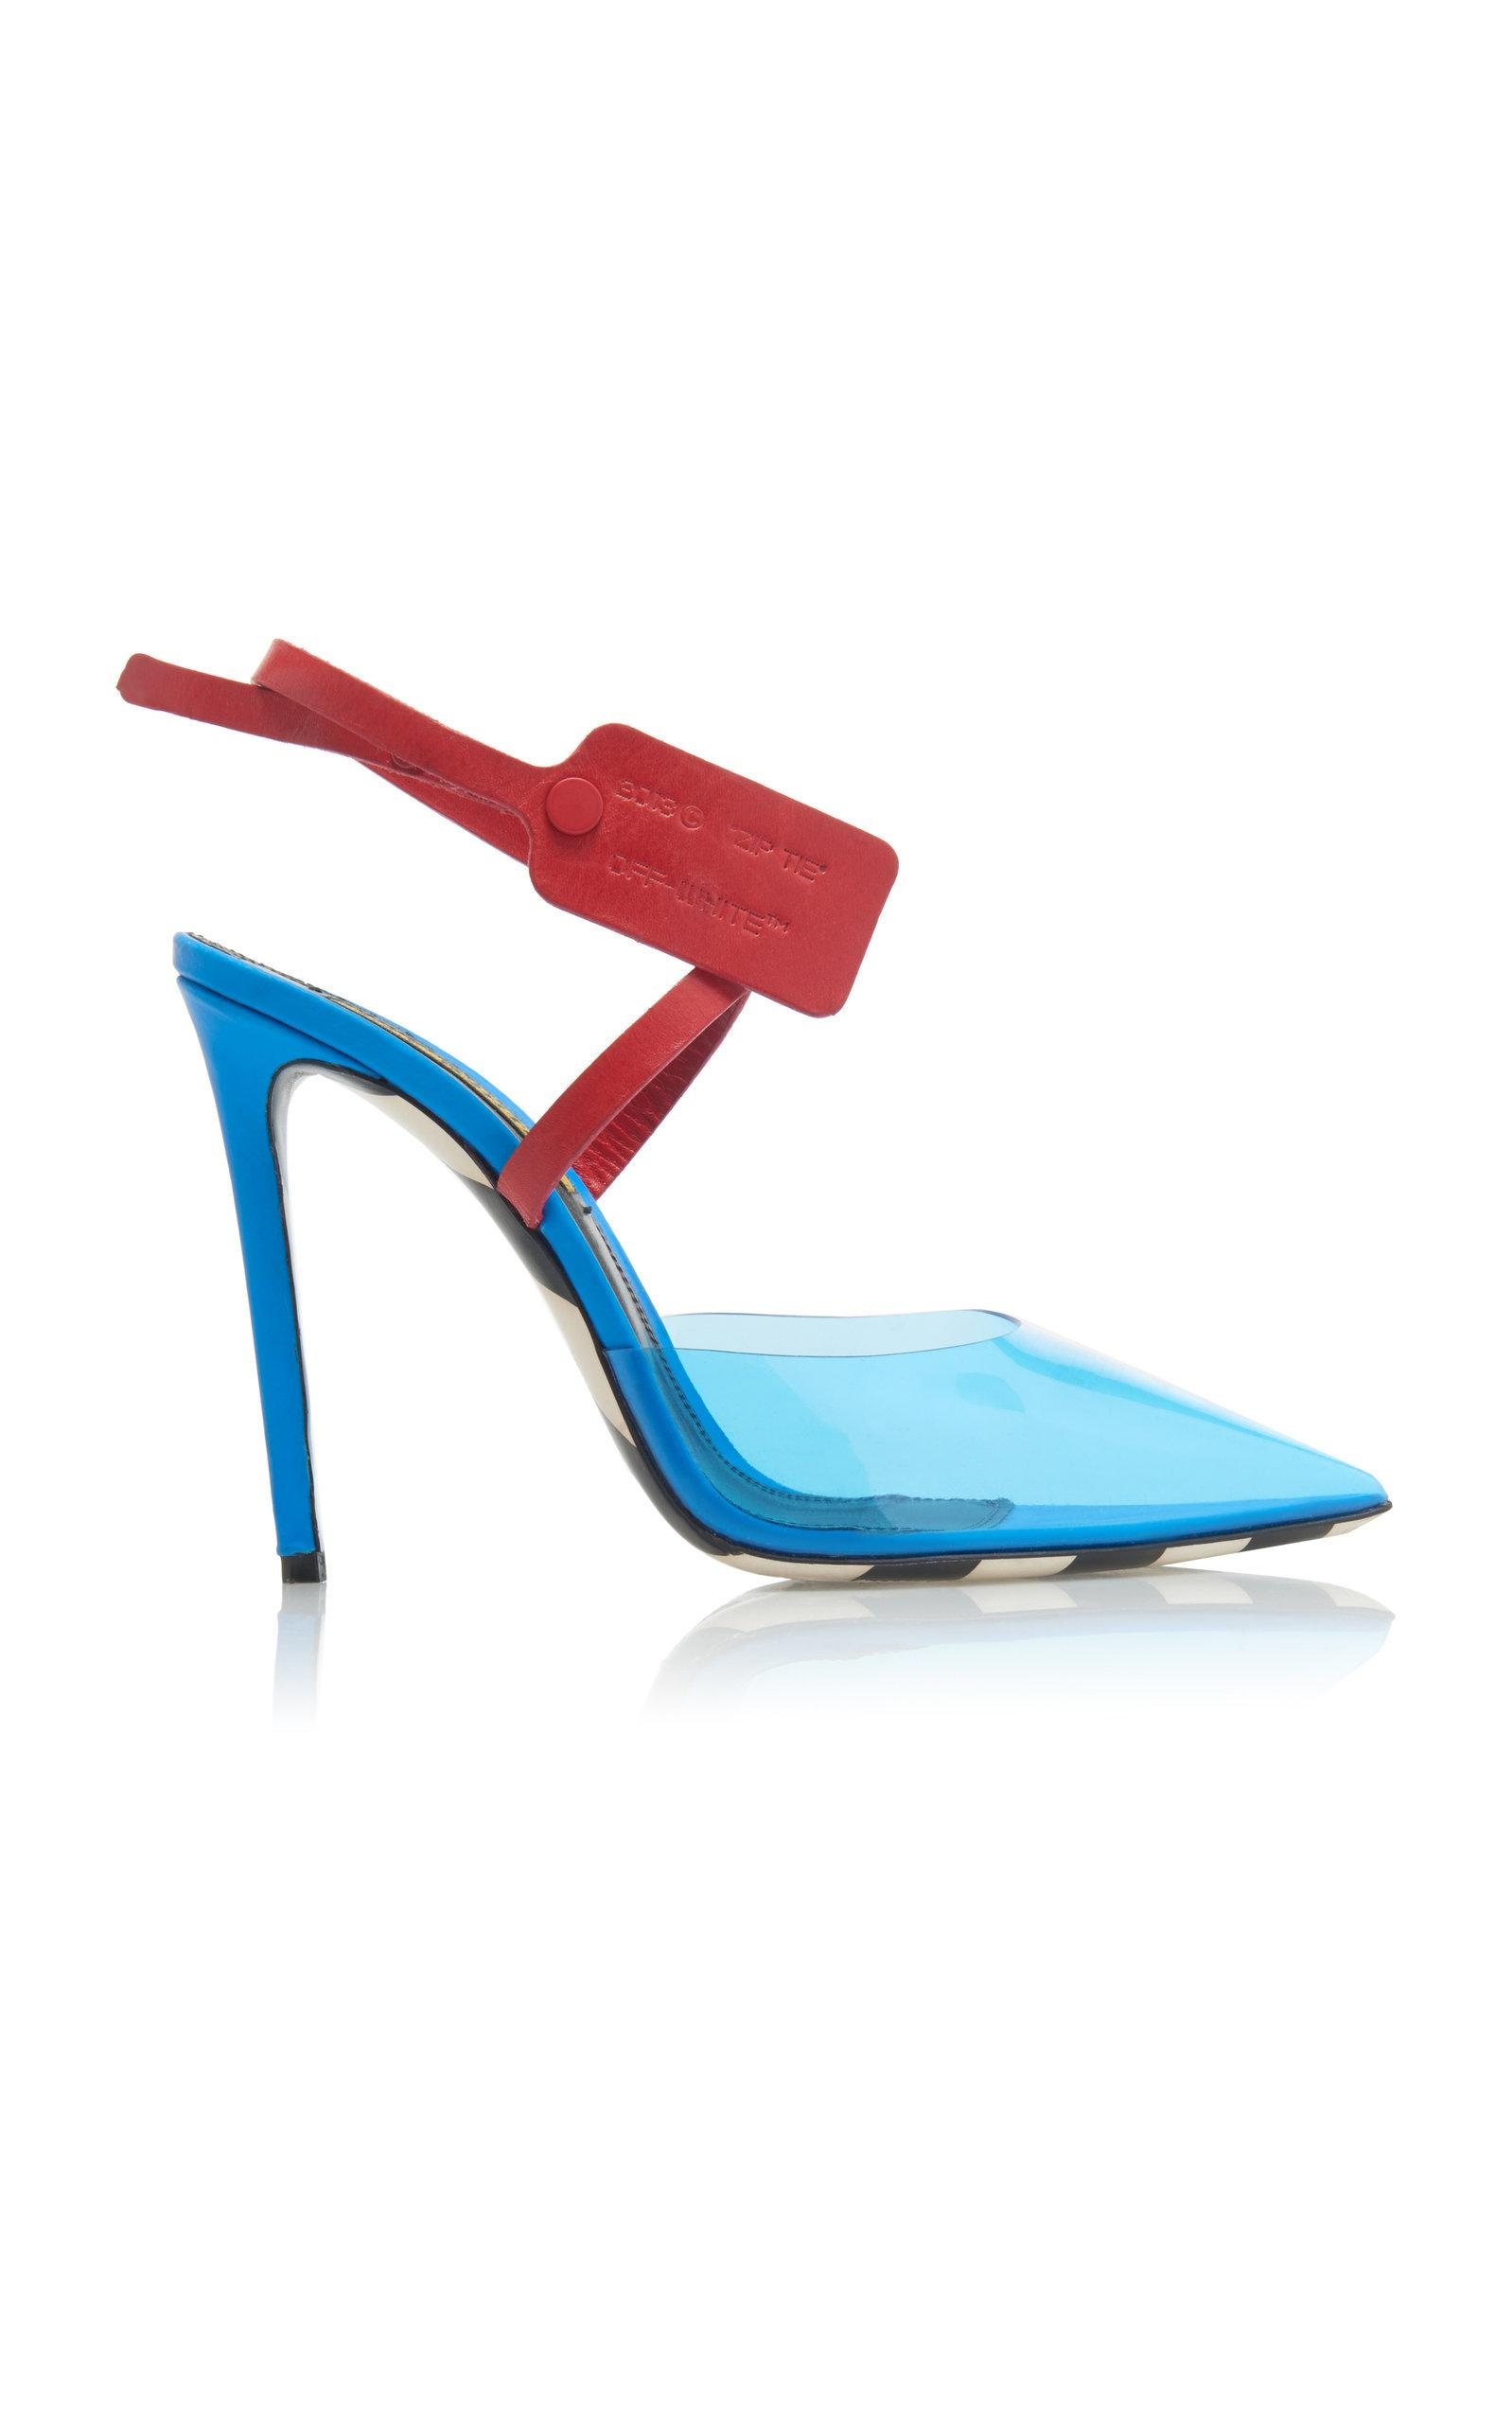 ac10faf473b9 Off-White 110Mm Zip Tie Plexi & Leather Pumps In 3000 Blue No Color. Moda  Operandi. 320Login to see price